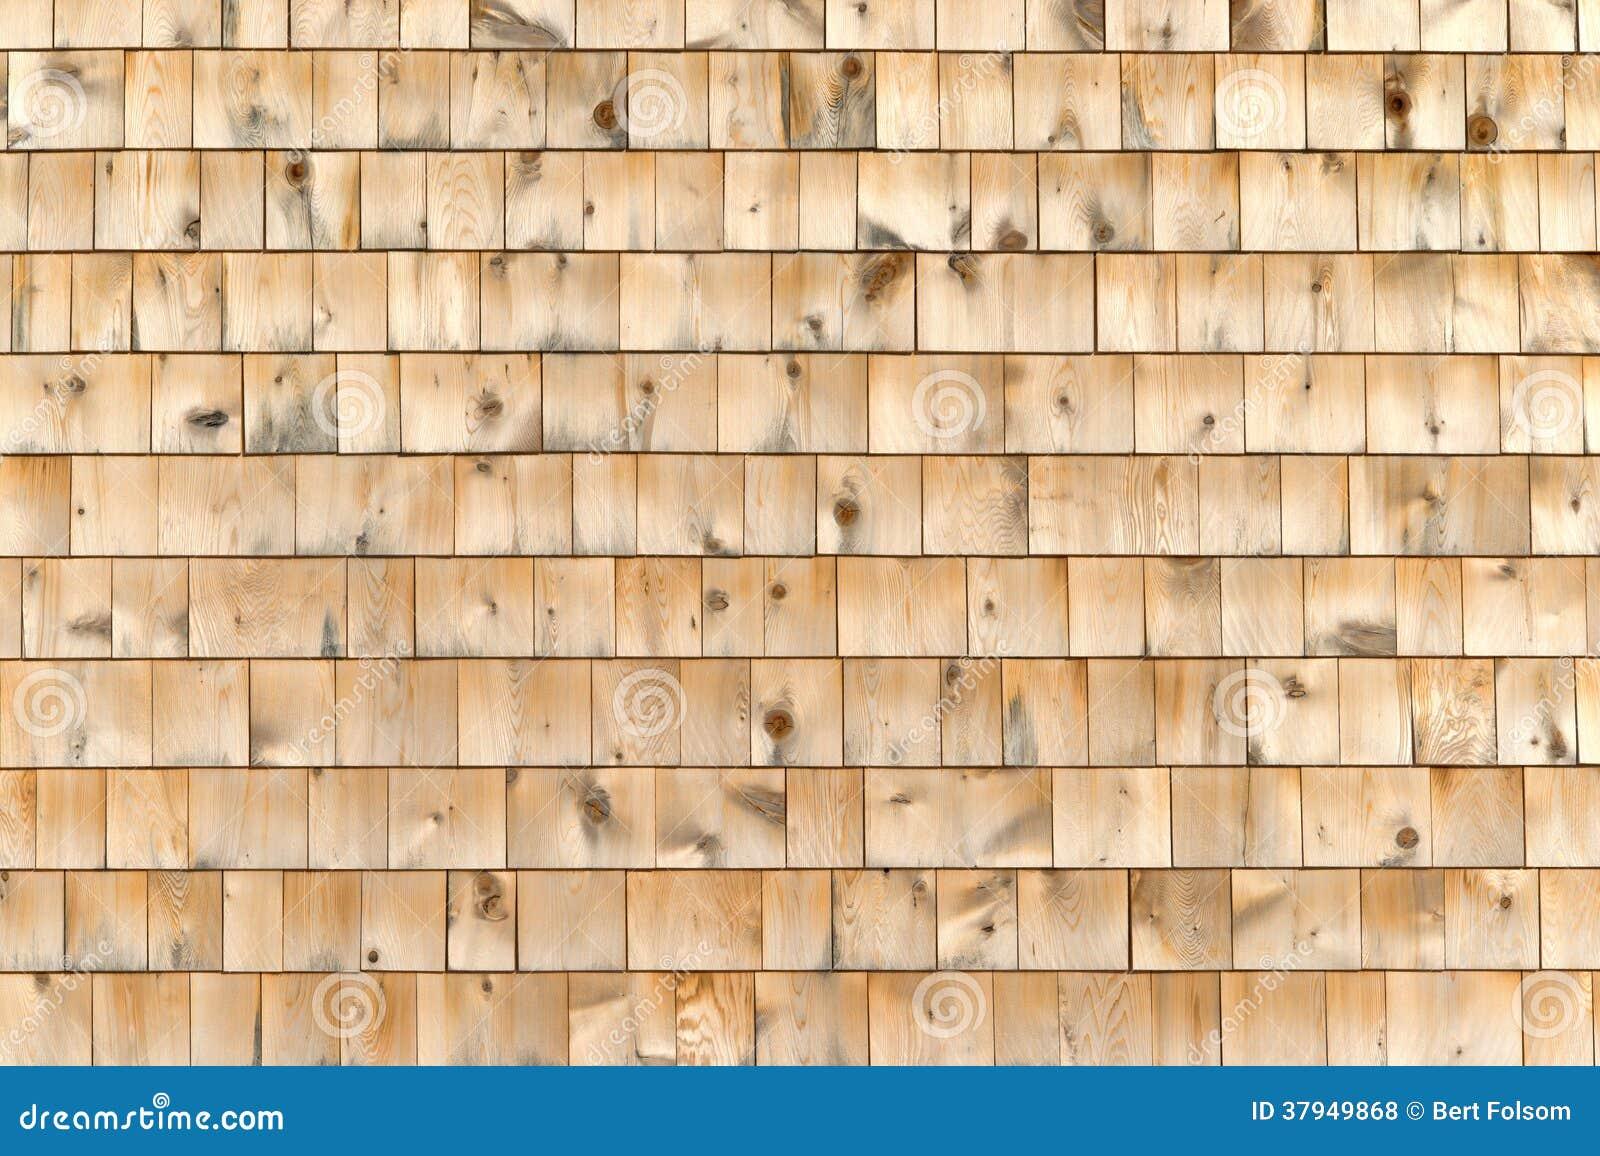 Exterior Wall Shingles : Cedar shingle wall exterior royalty free stock photos